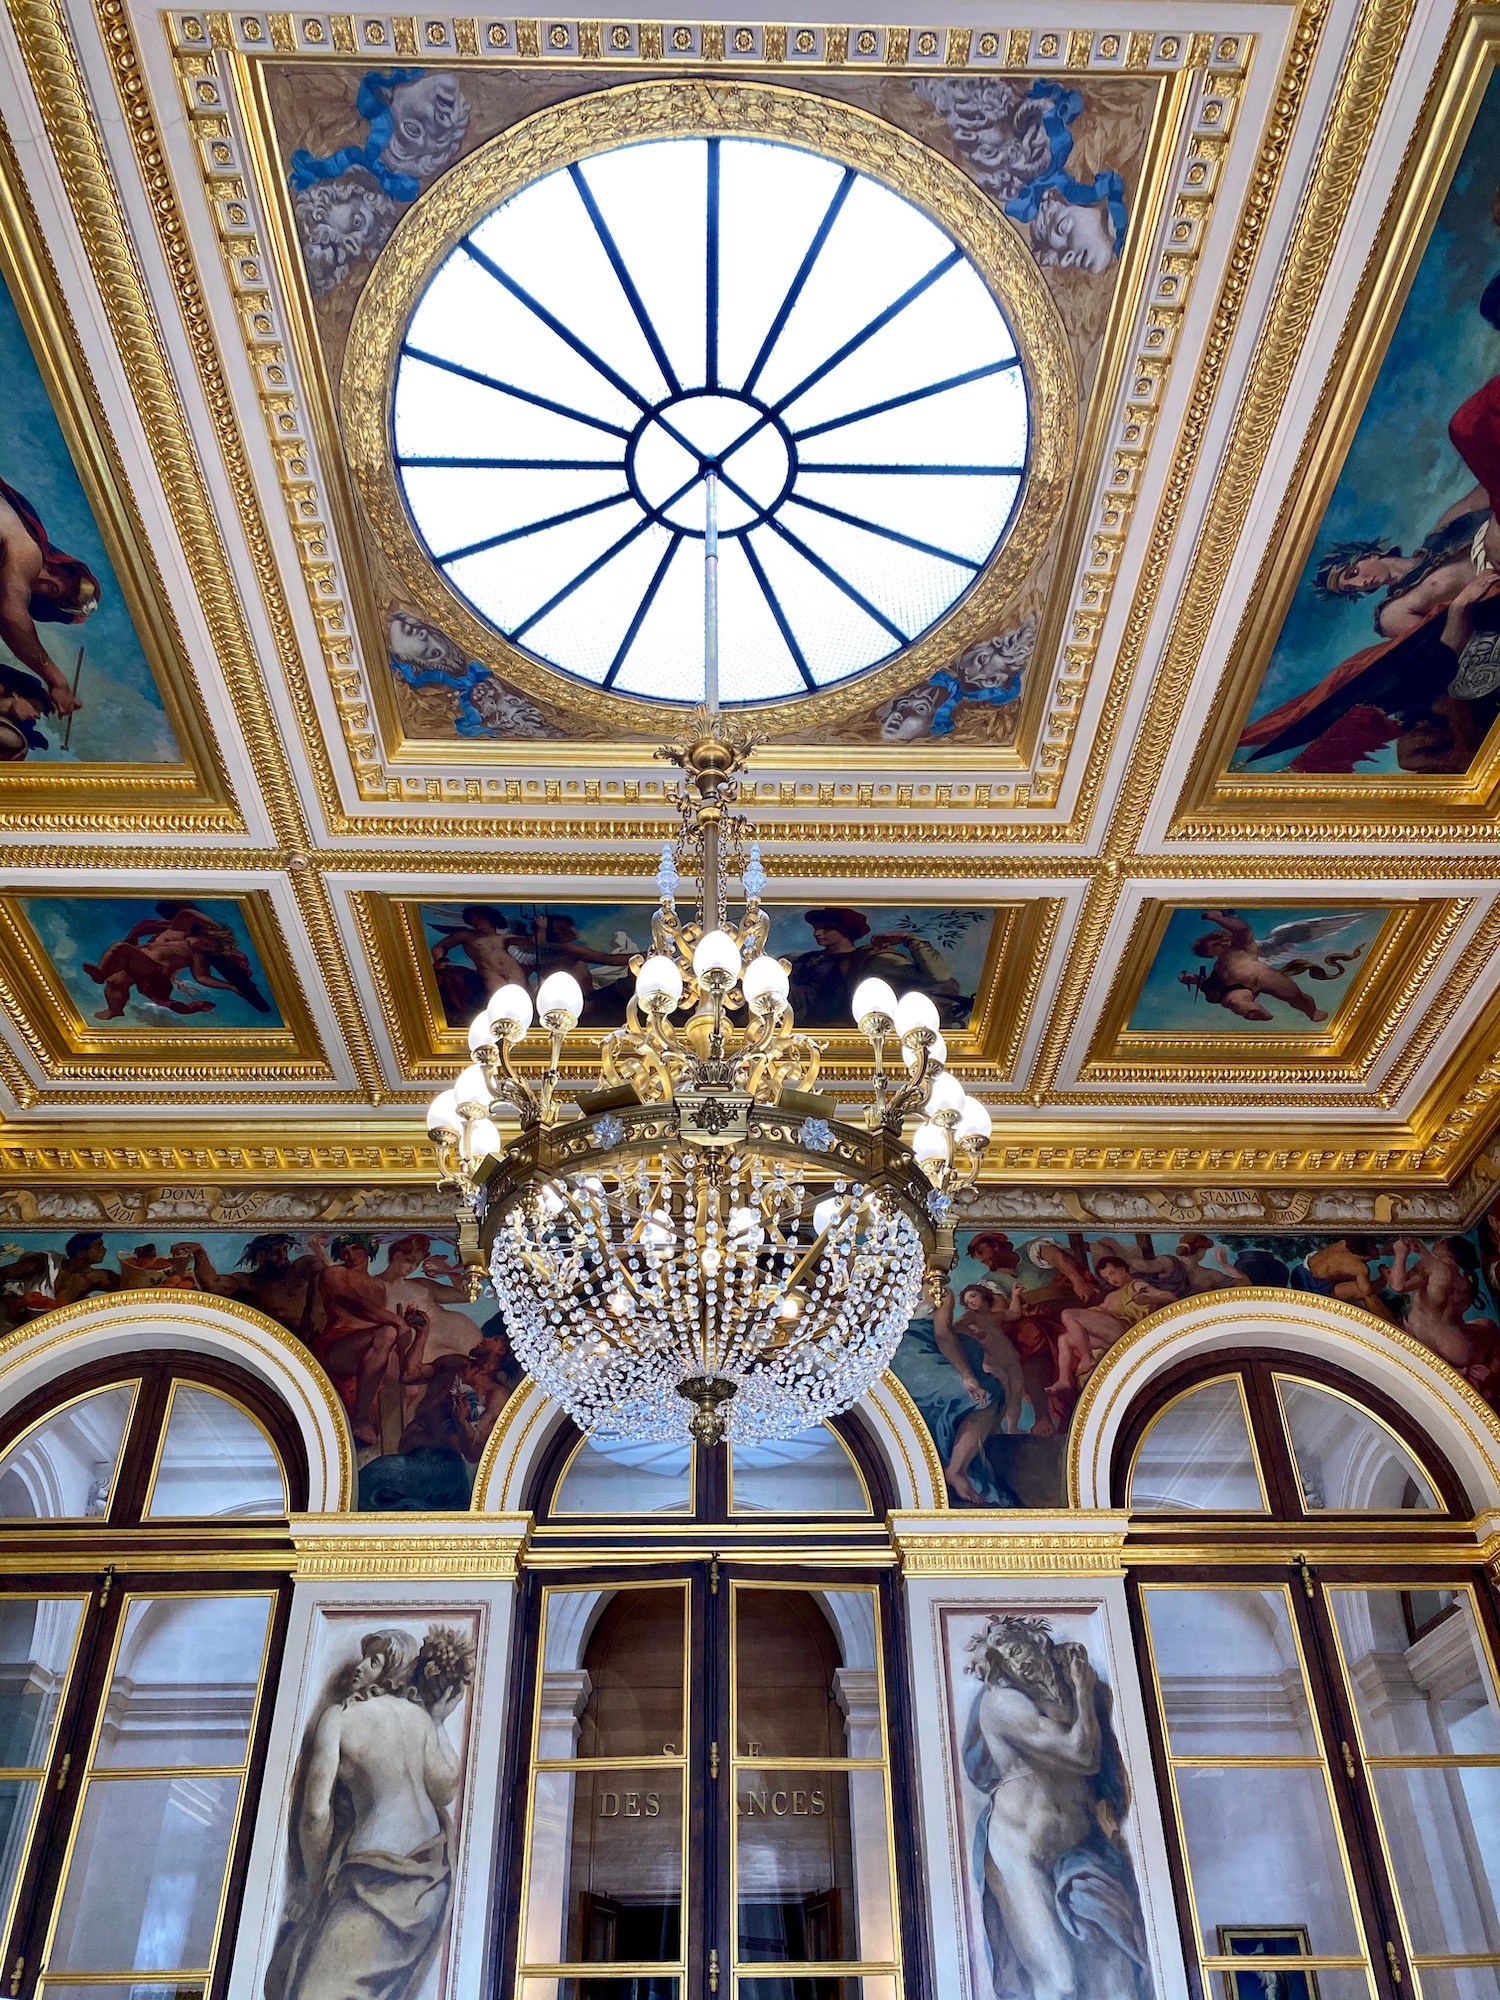 Delacroix ceiling